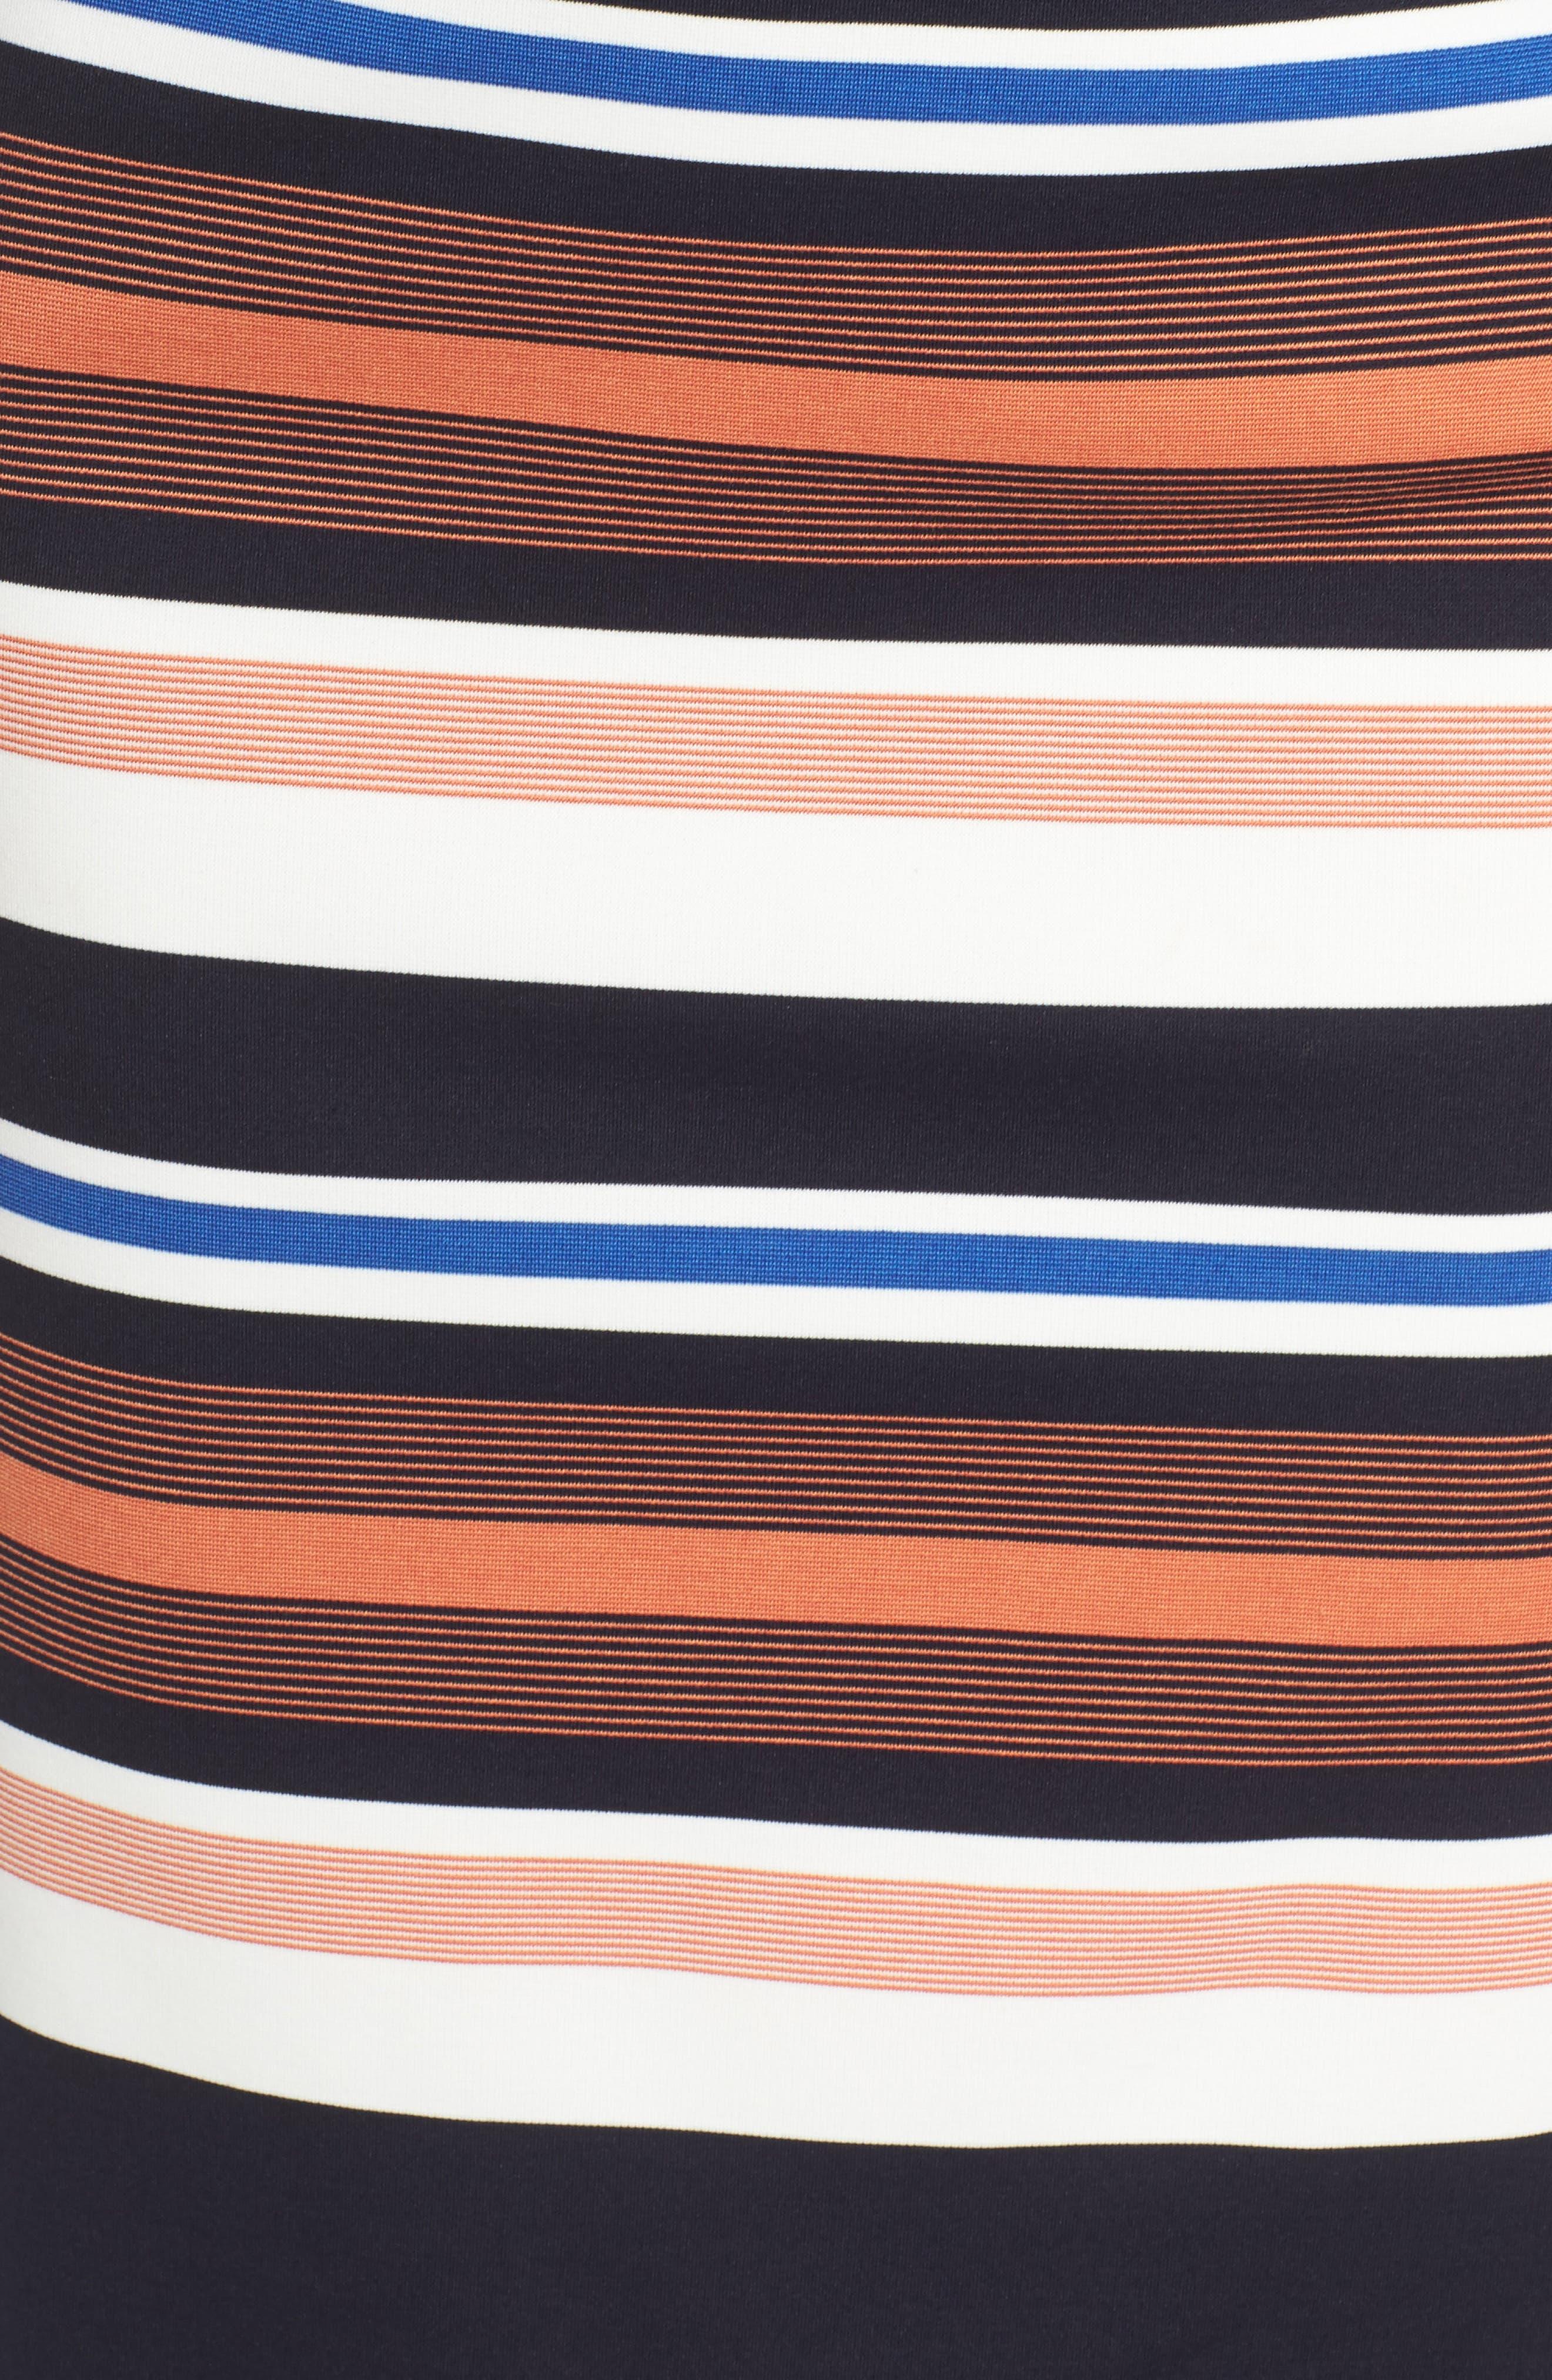 Stripe Body-Con Dress,                             Alternate thumbnail 5, color,                             001